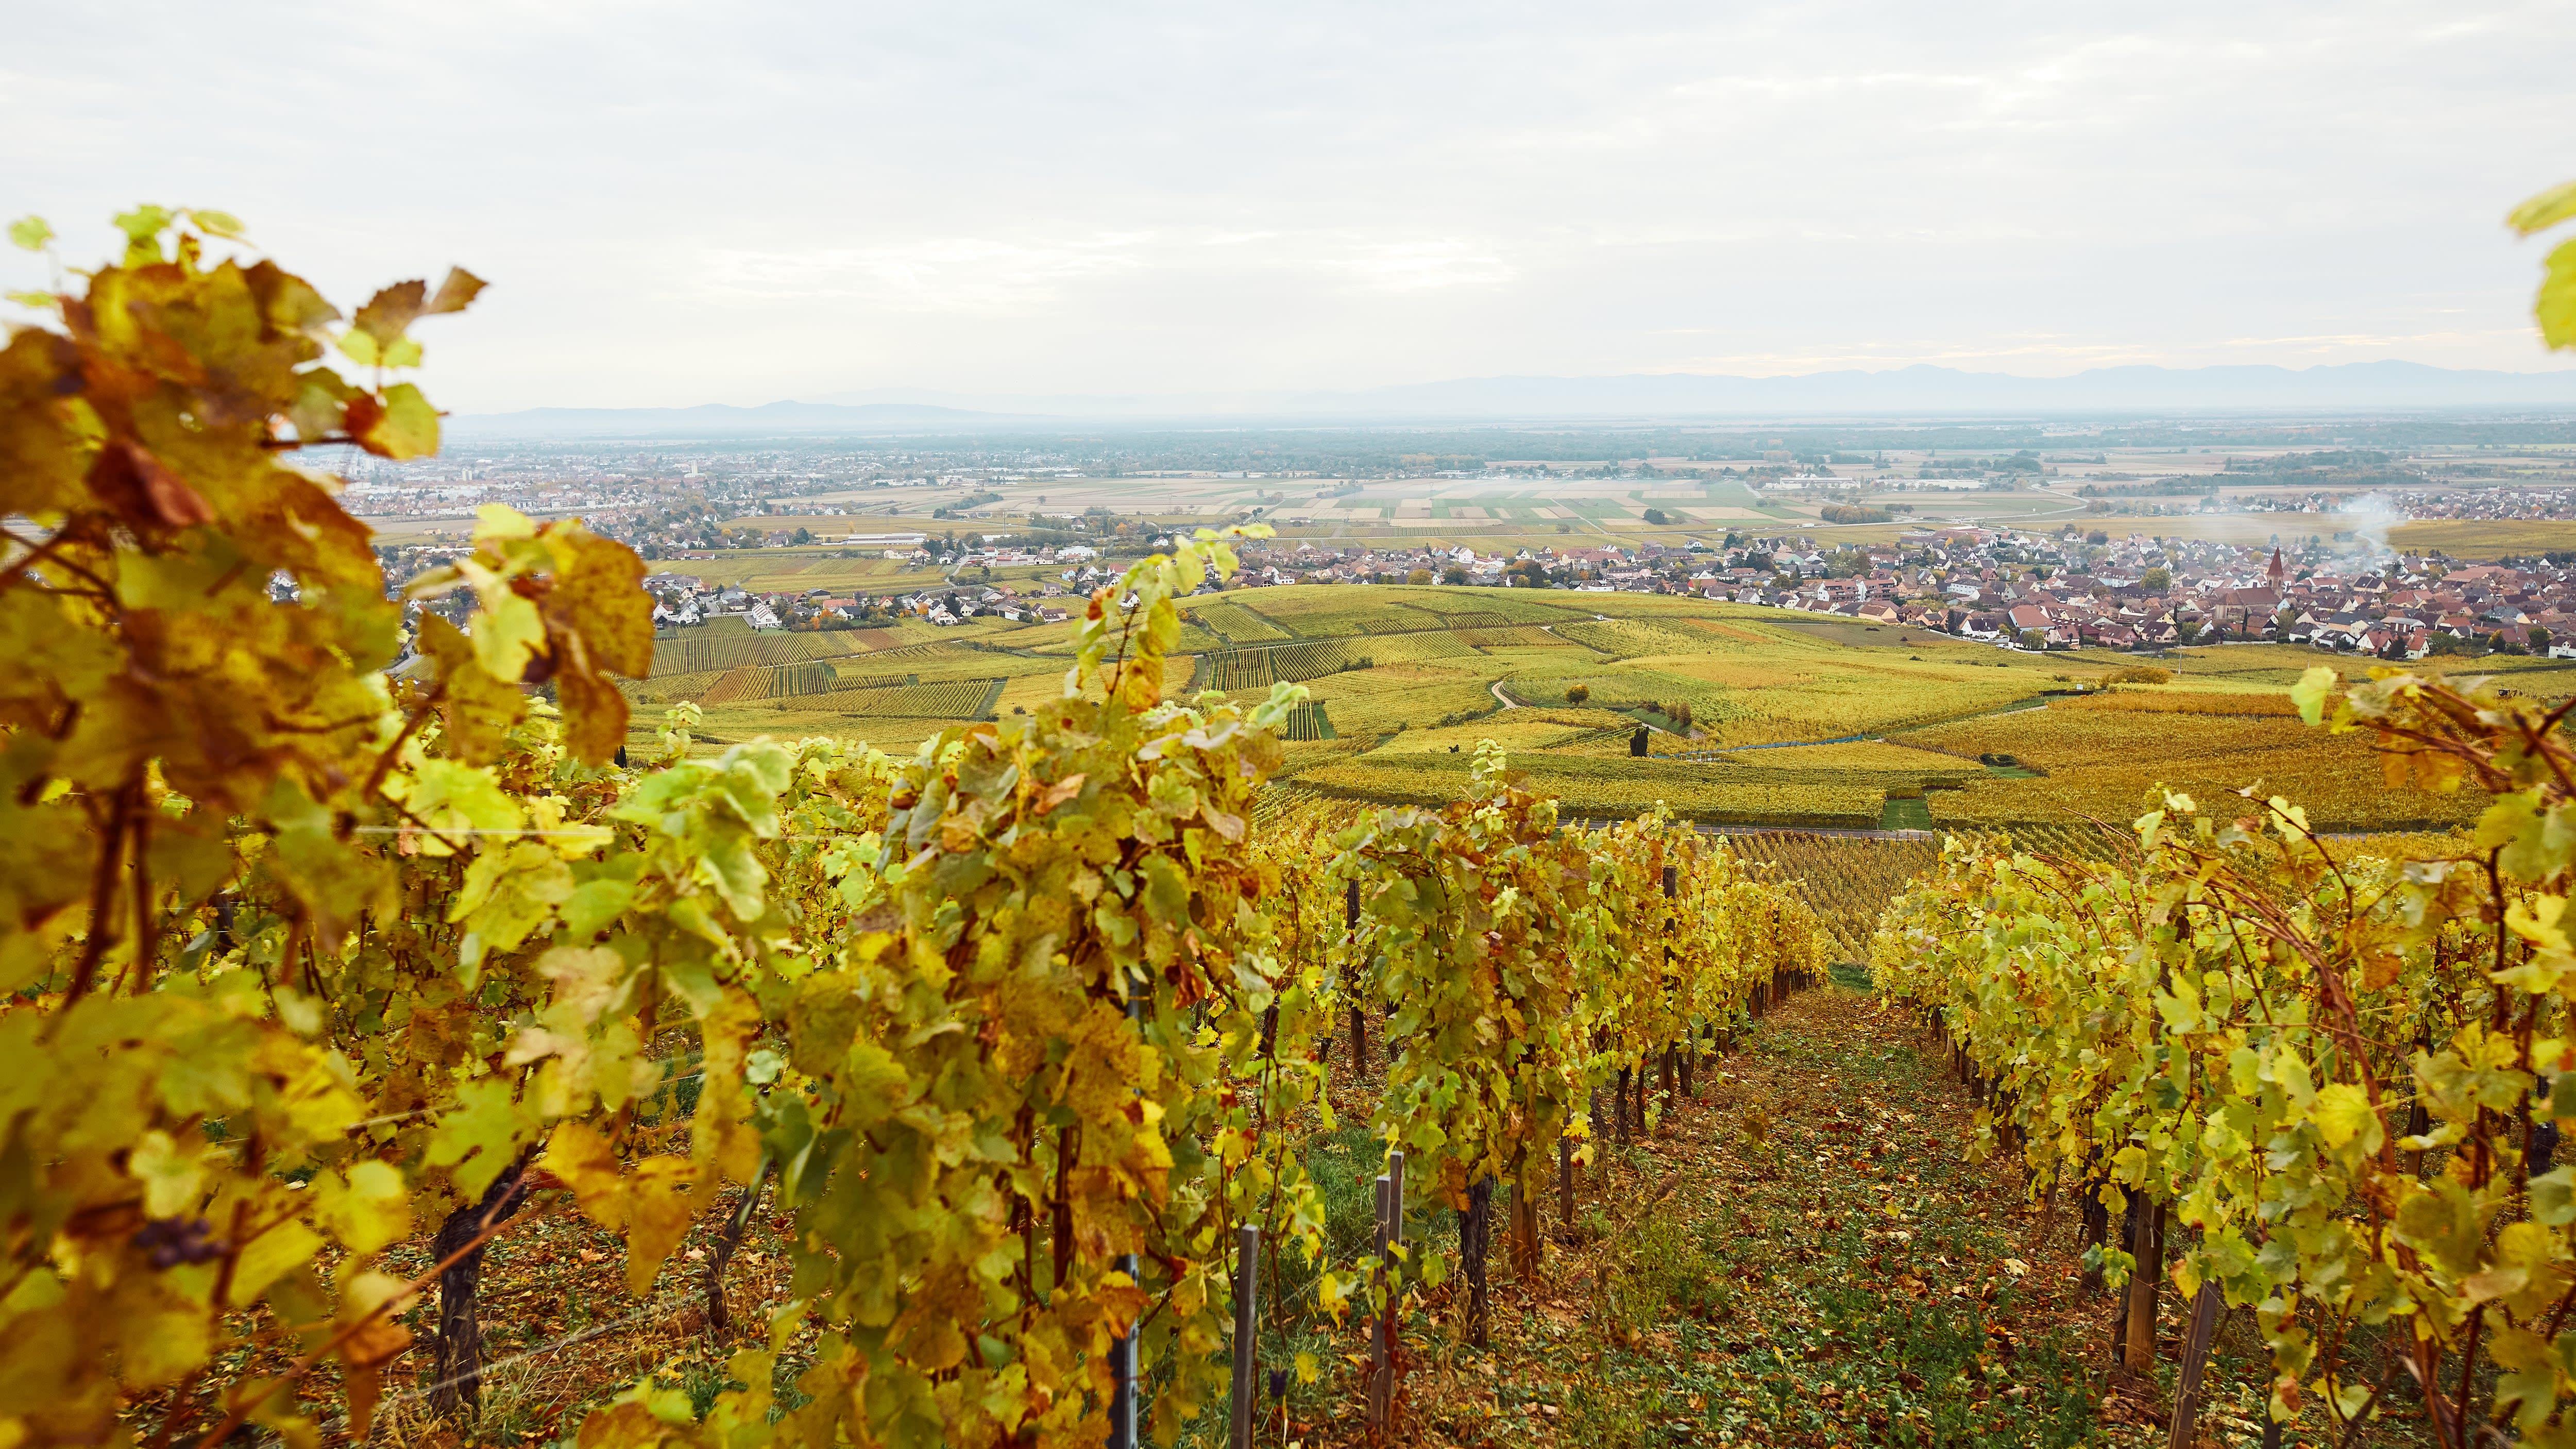 A wine appellation